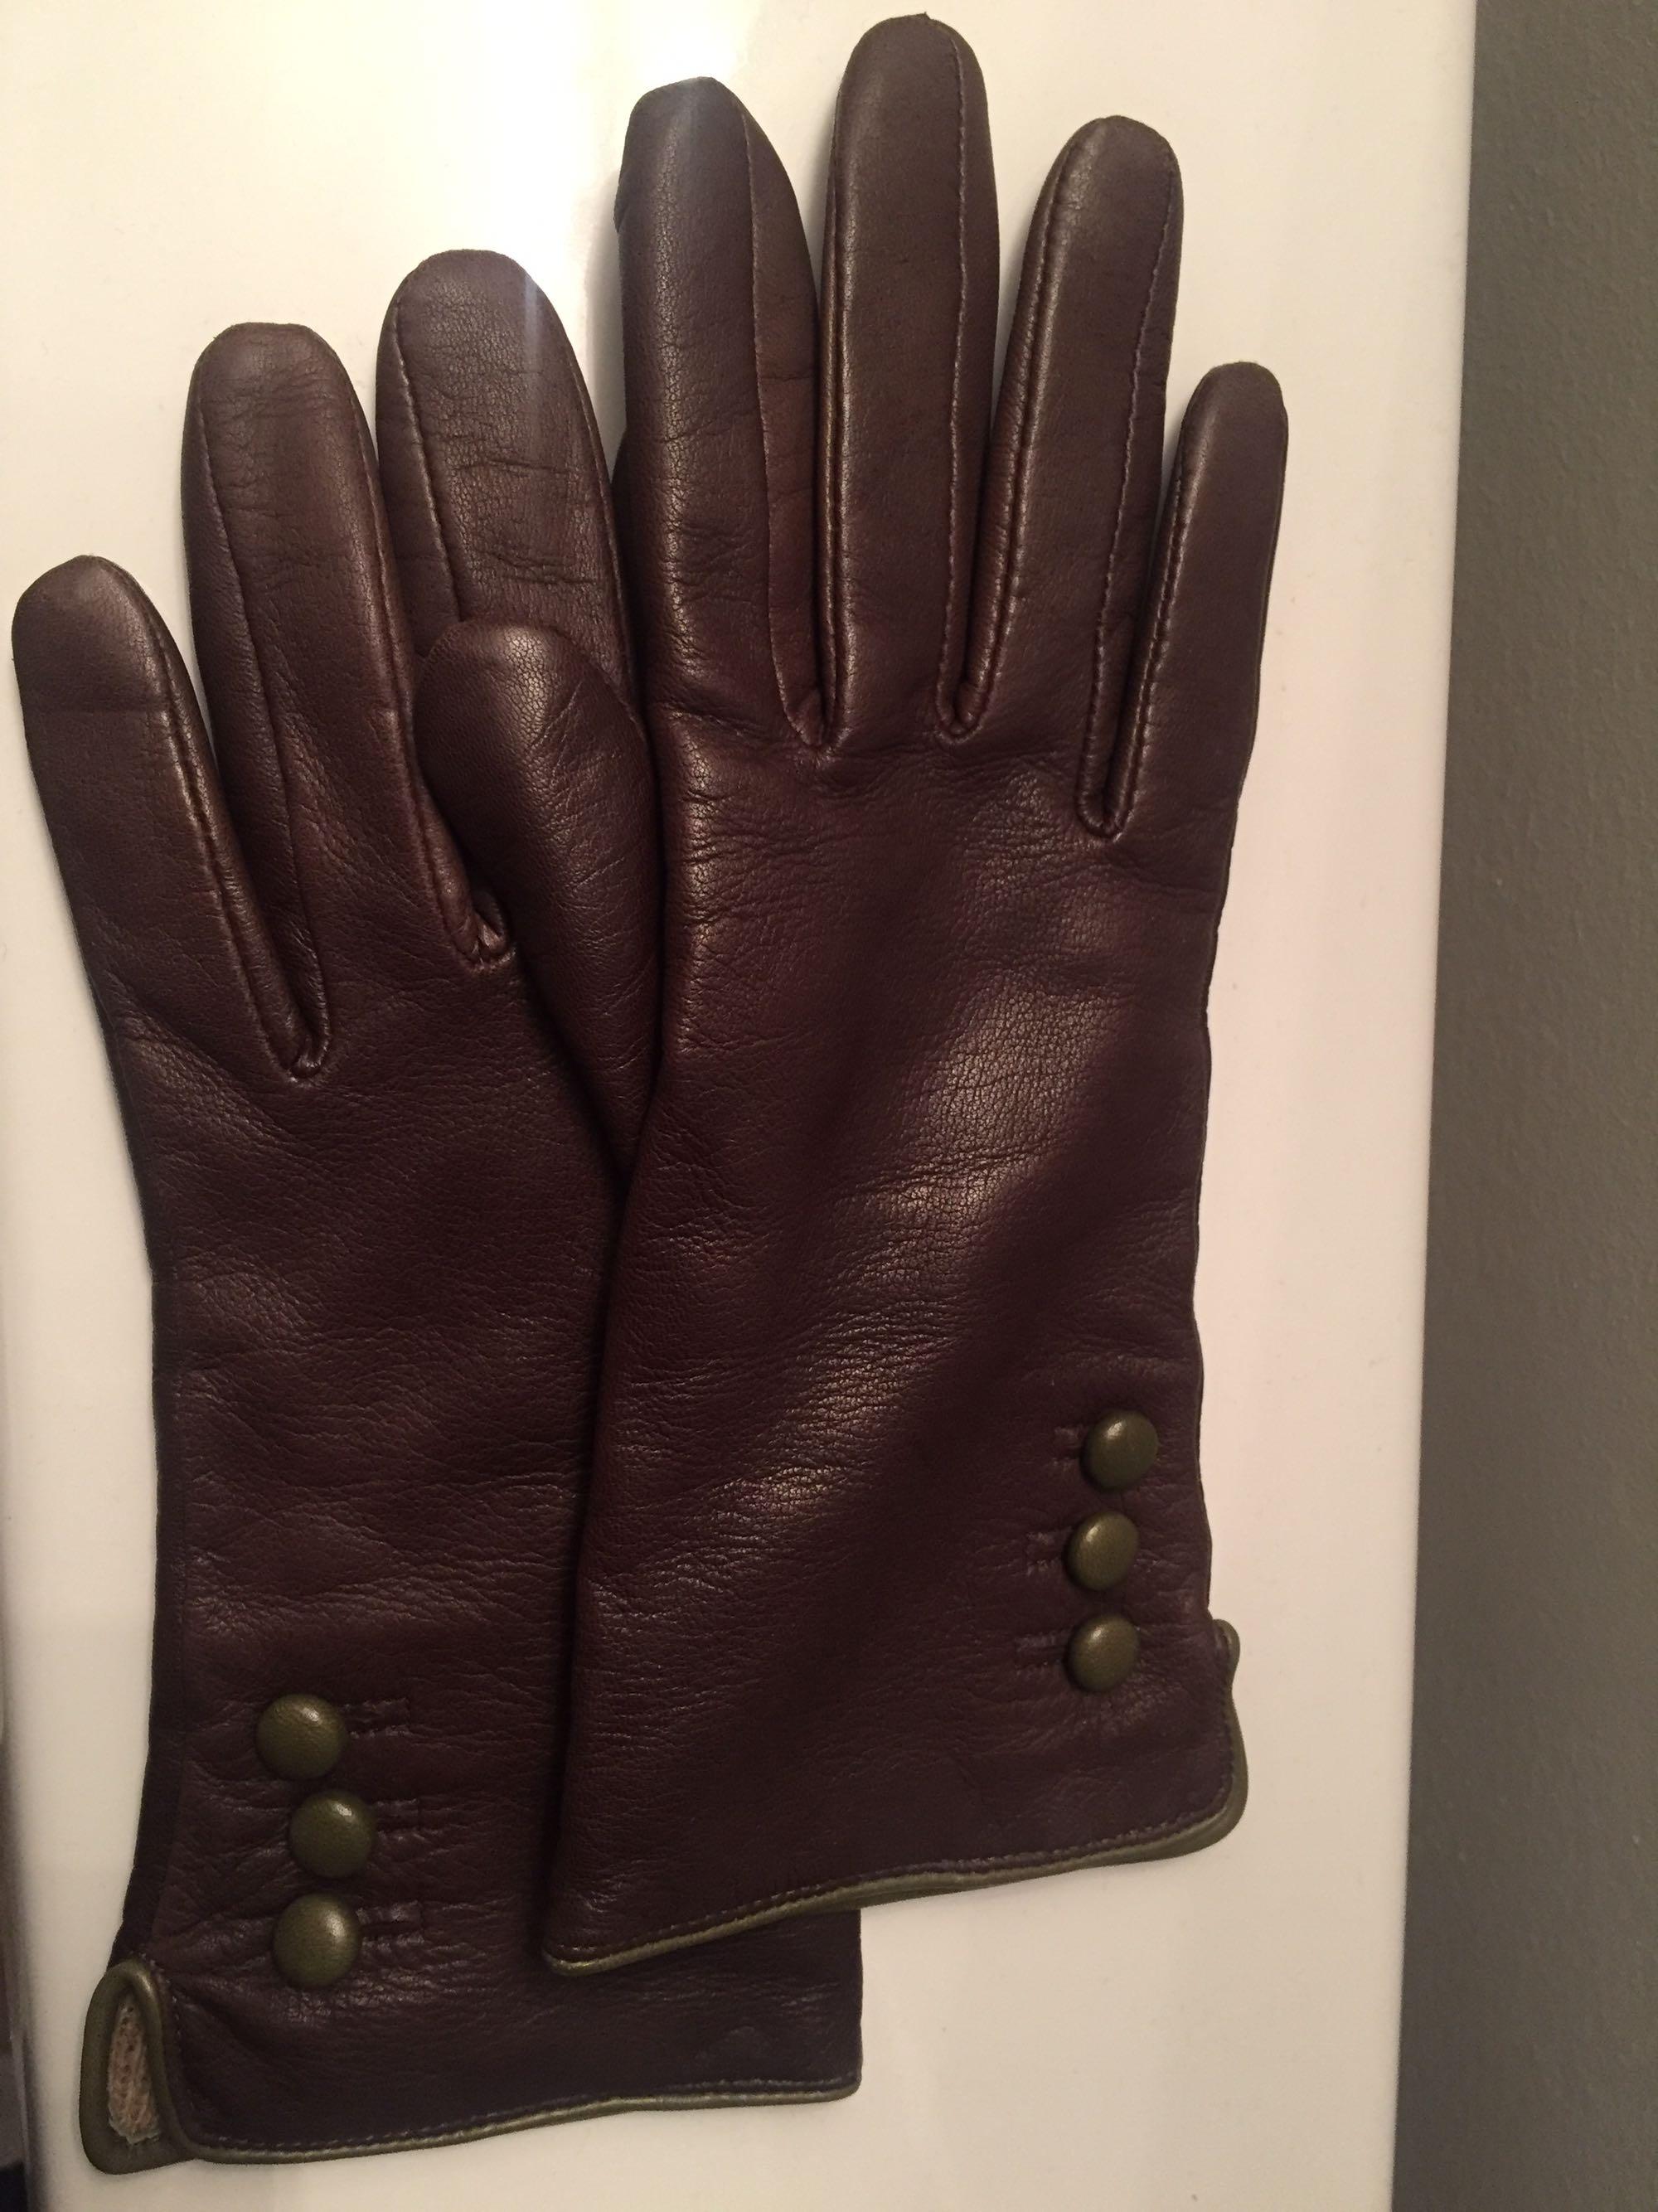 Danier brown leather gloves